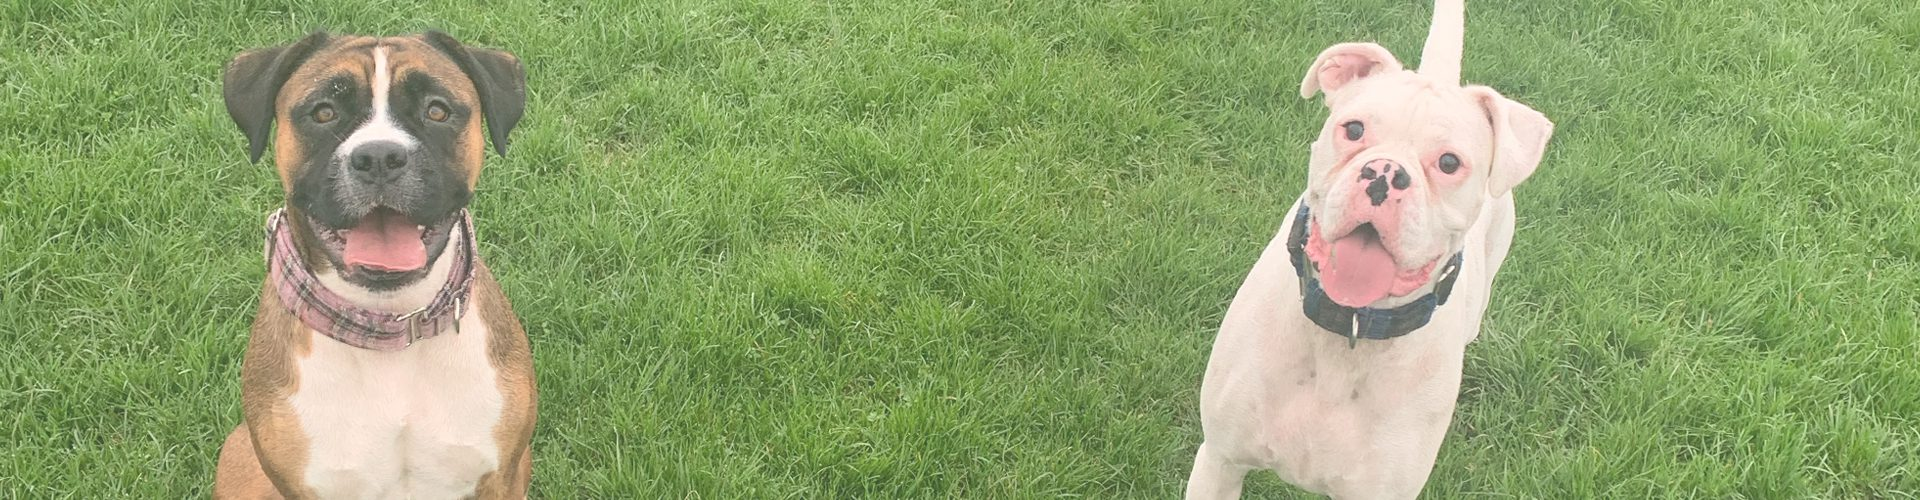 a brown boxer dog and wa white boxer dog on grass